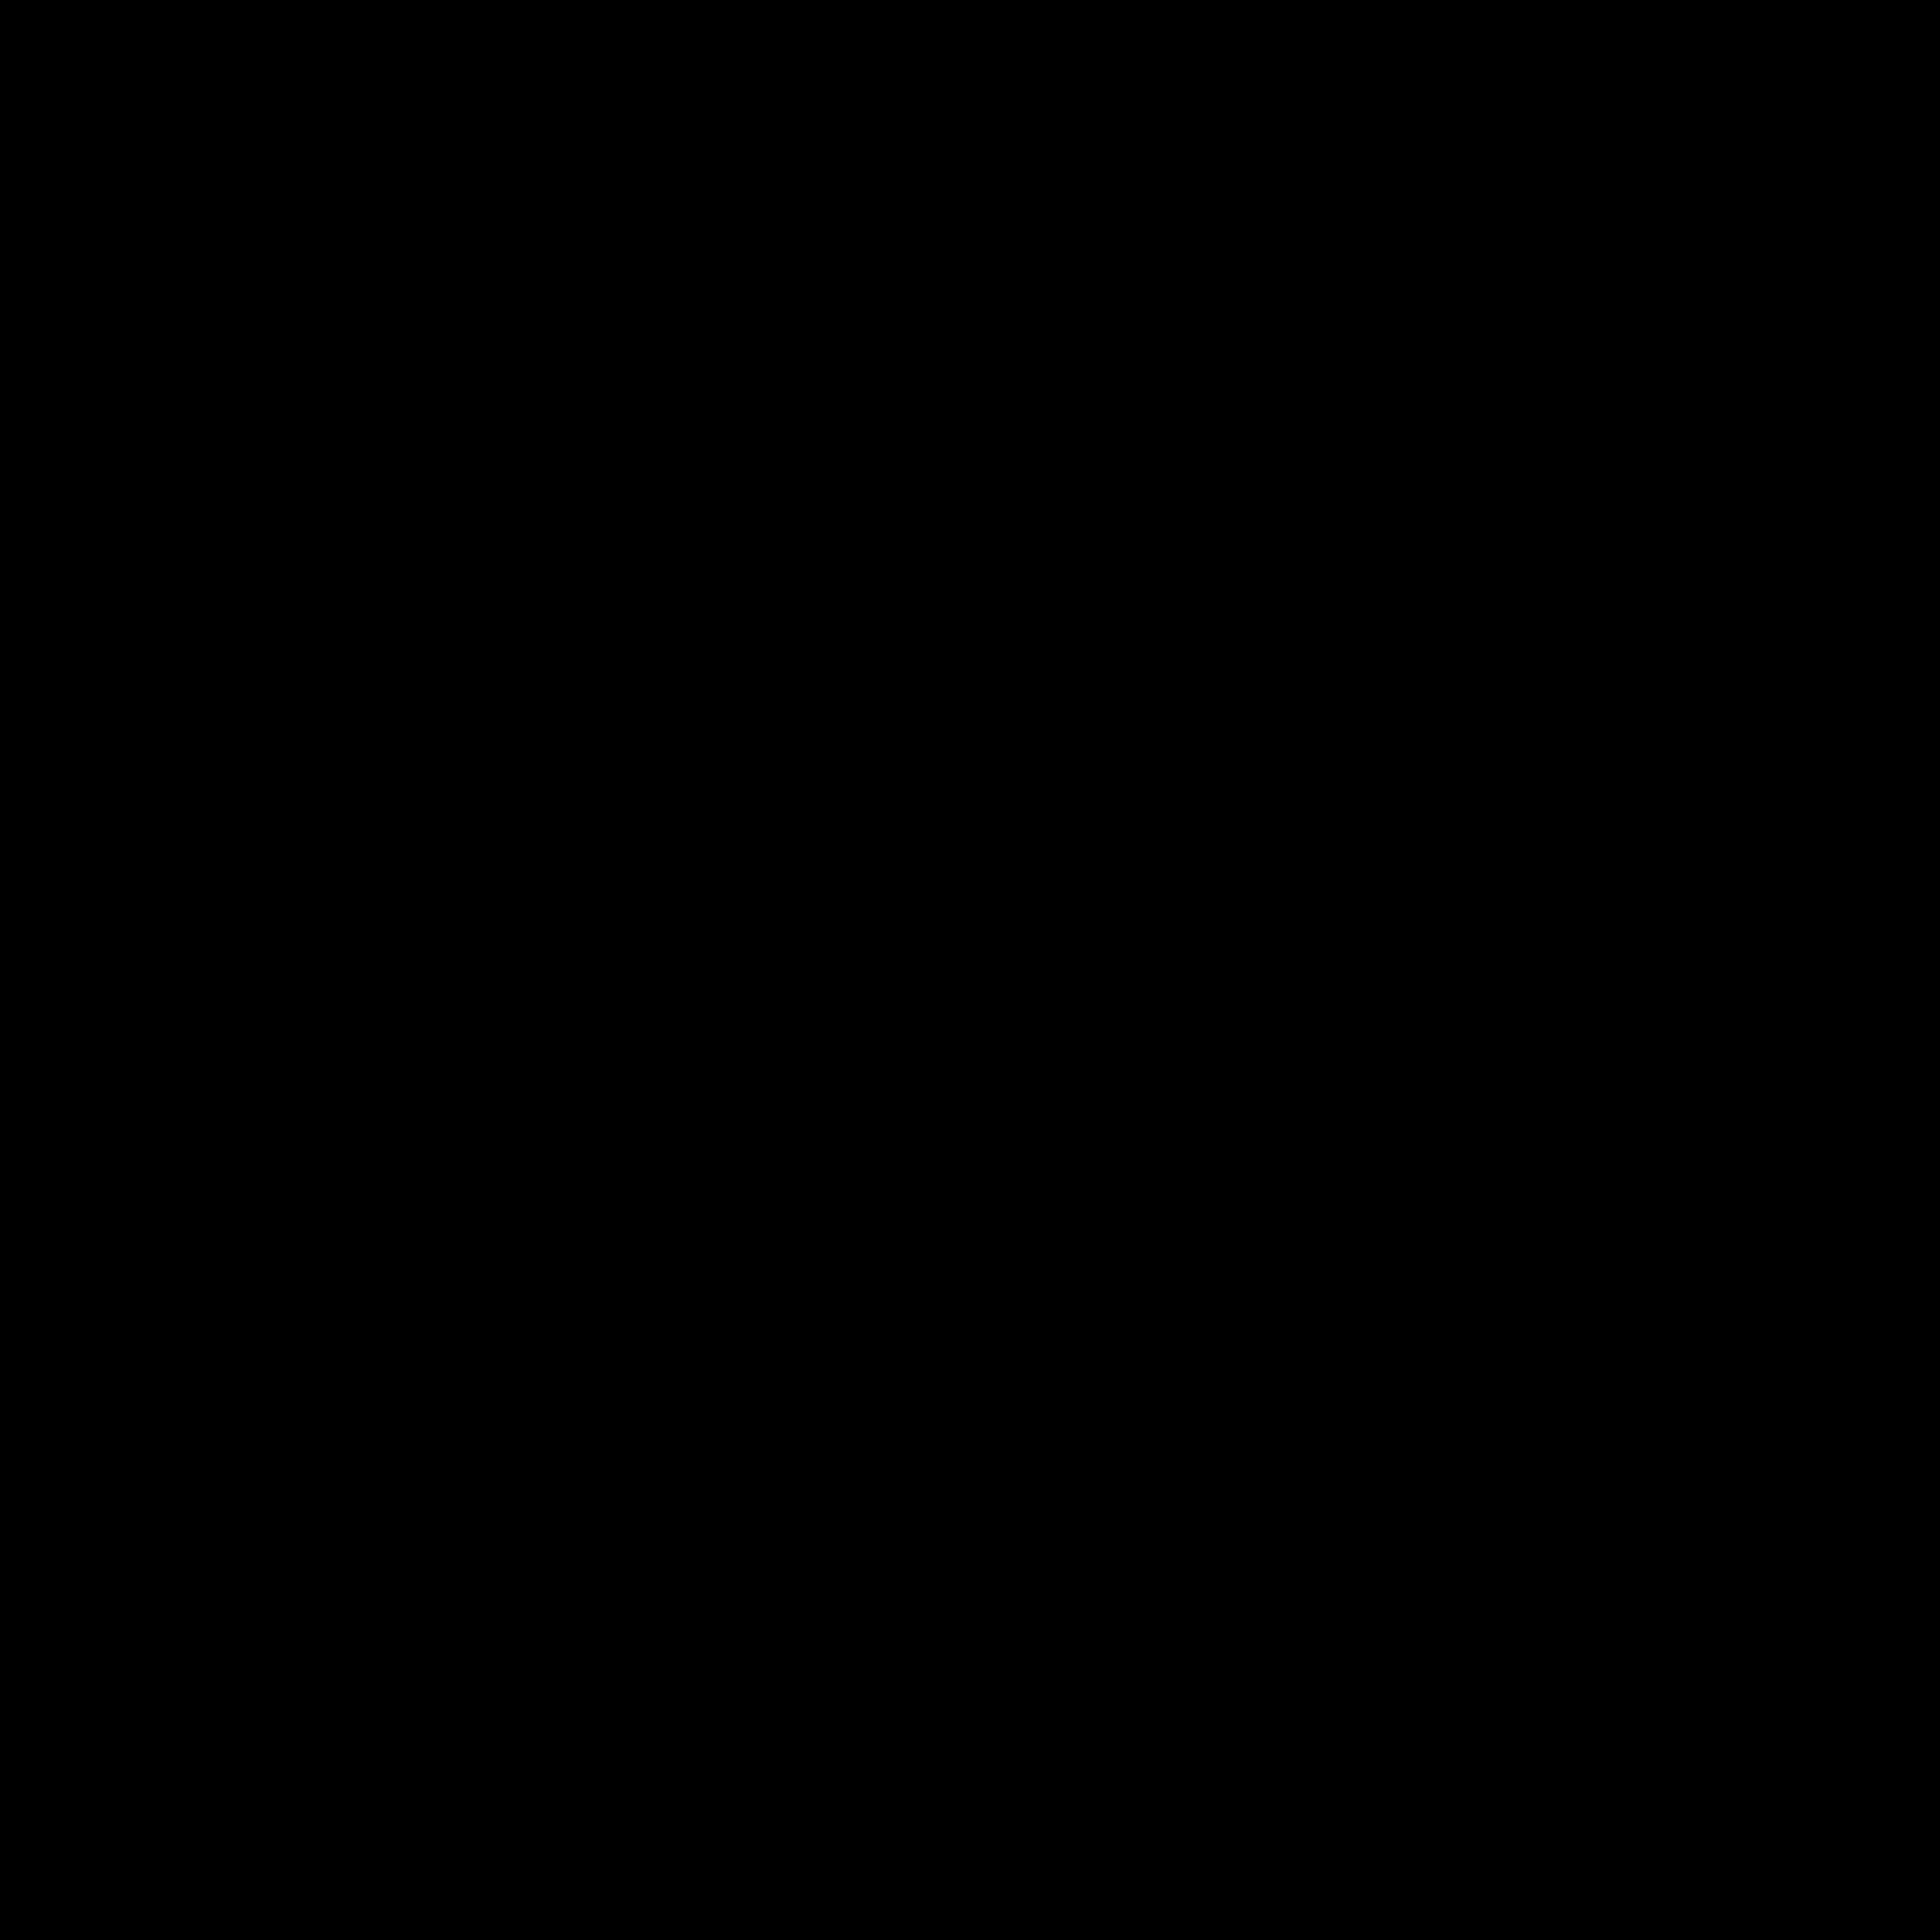 Bbc Logo Png Transparent &